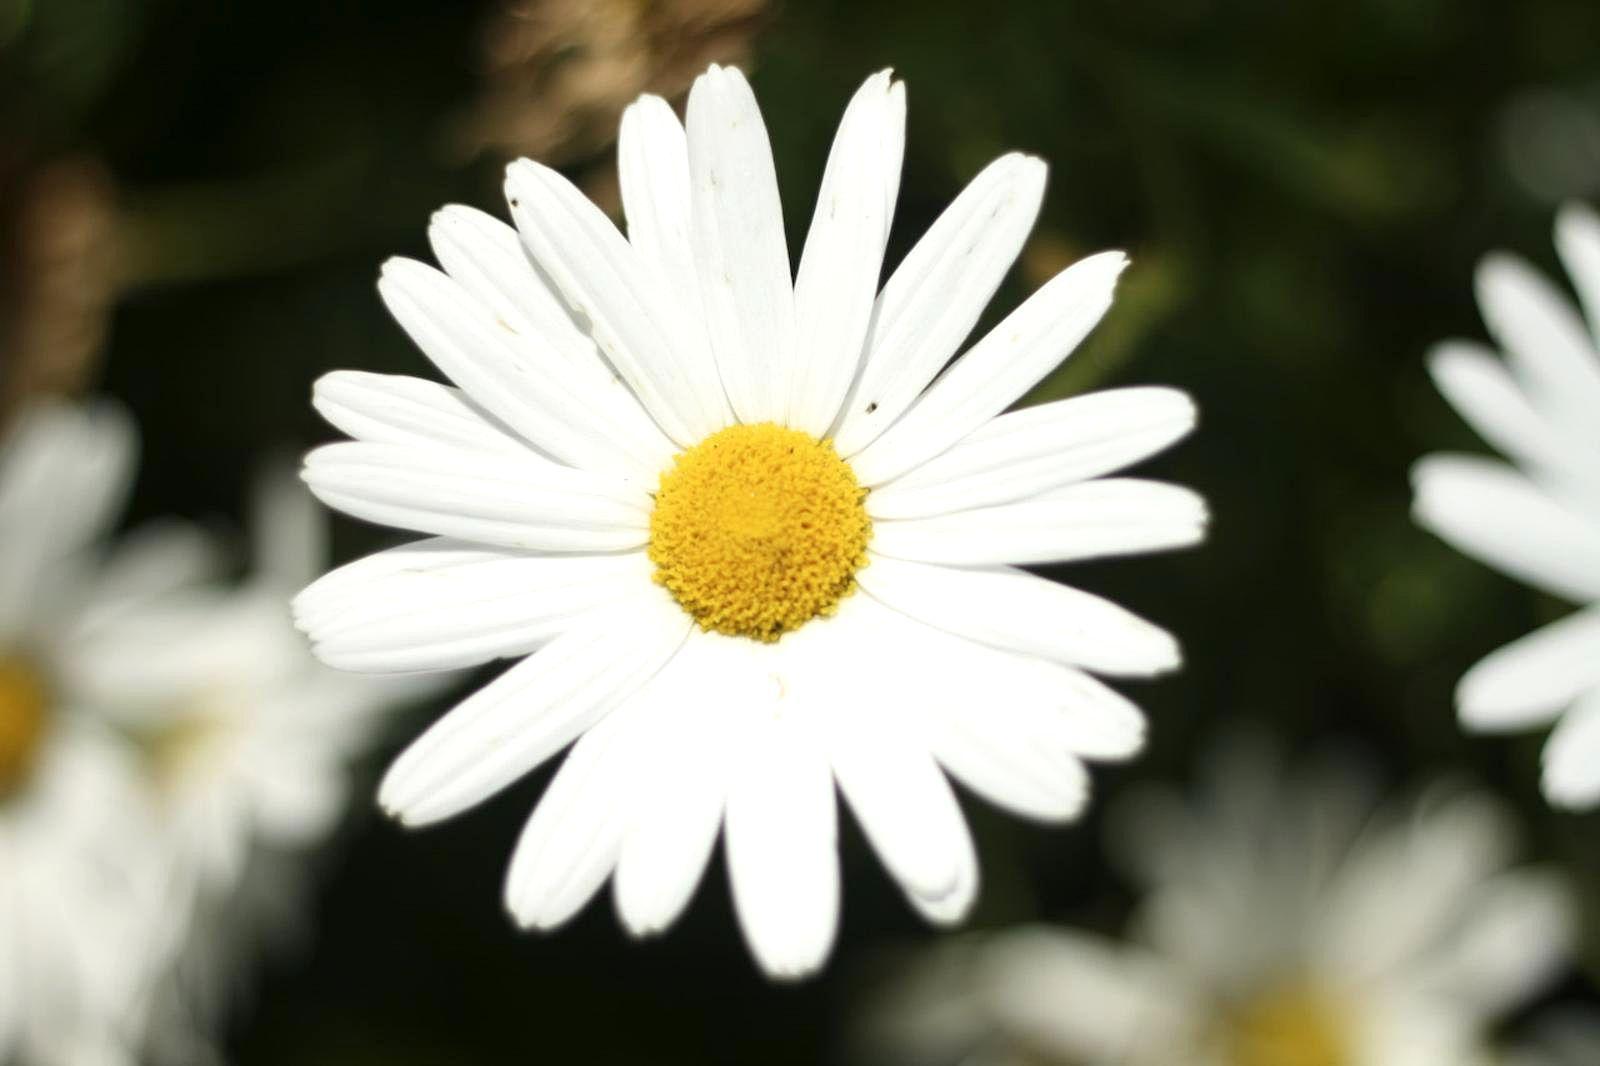 Beautiful white flower embrocation liniment gift images for white flower embrocation liniment gallery flower decoration ideas mightylinksfo